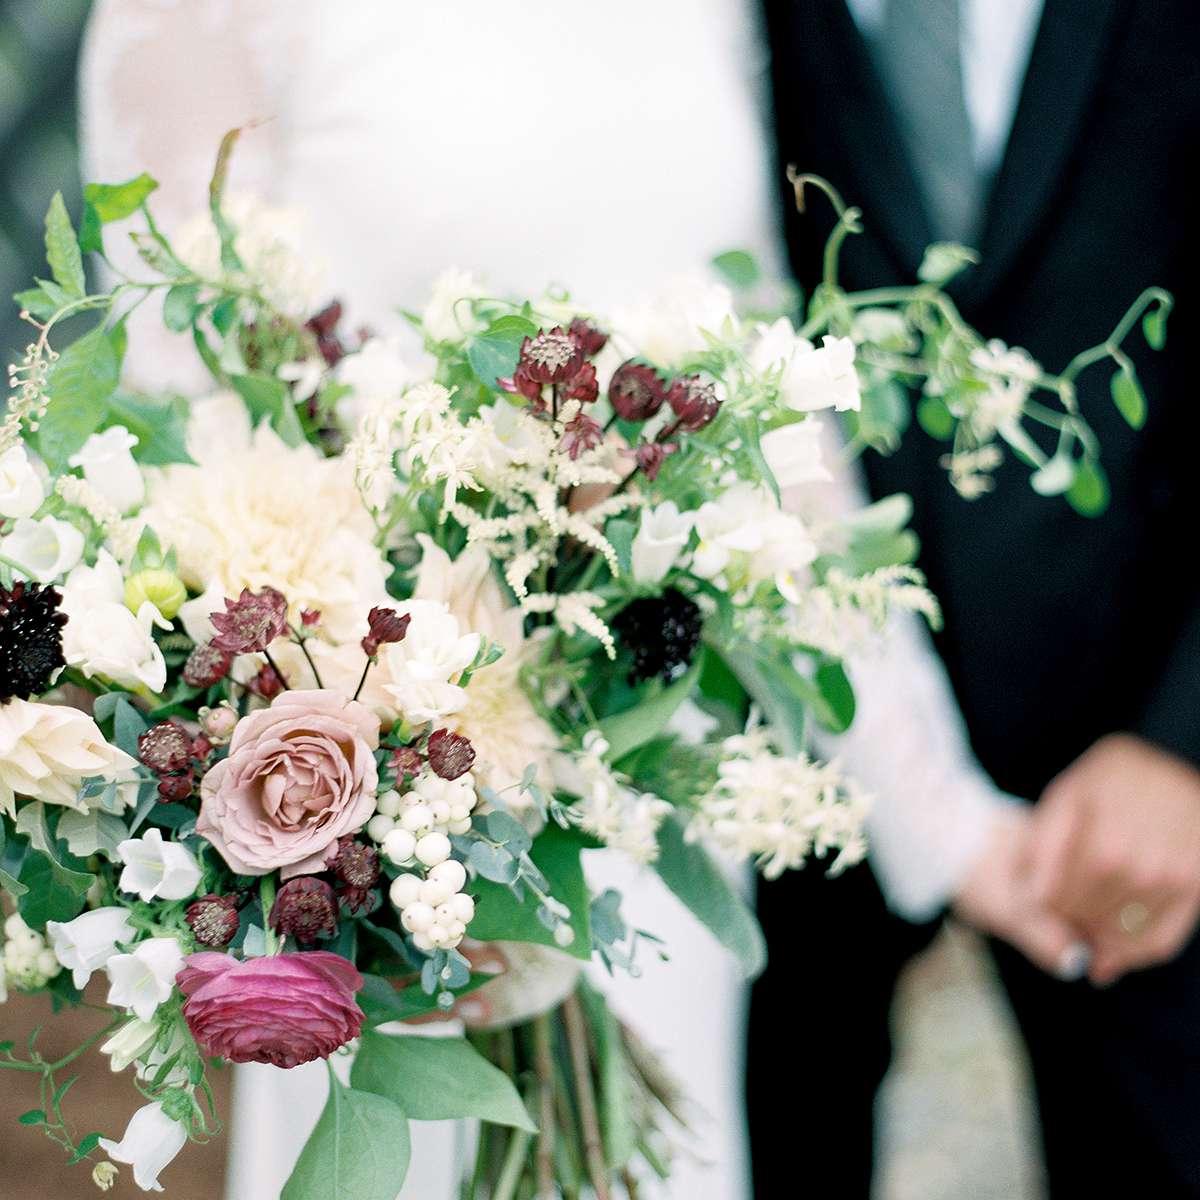 Ivory and mauve bouquet